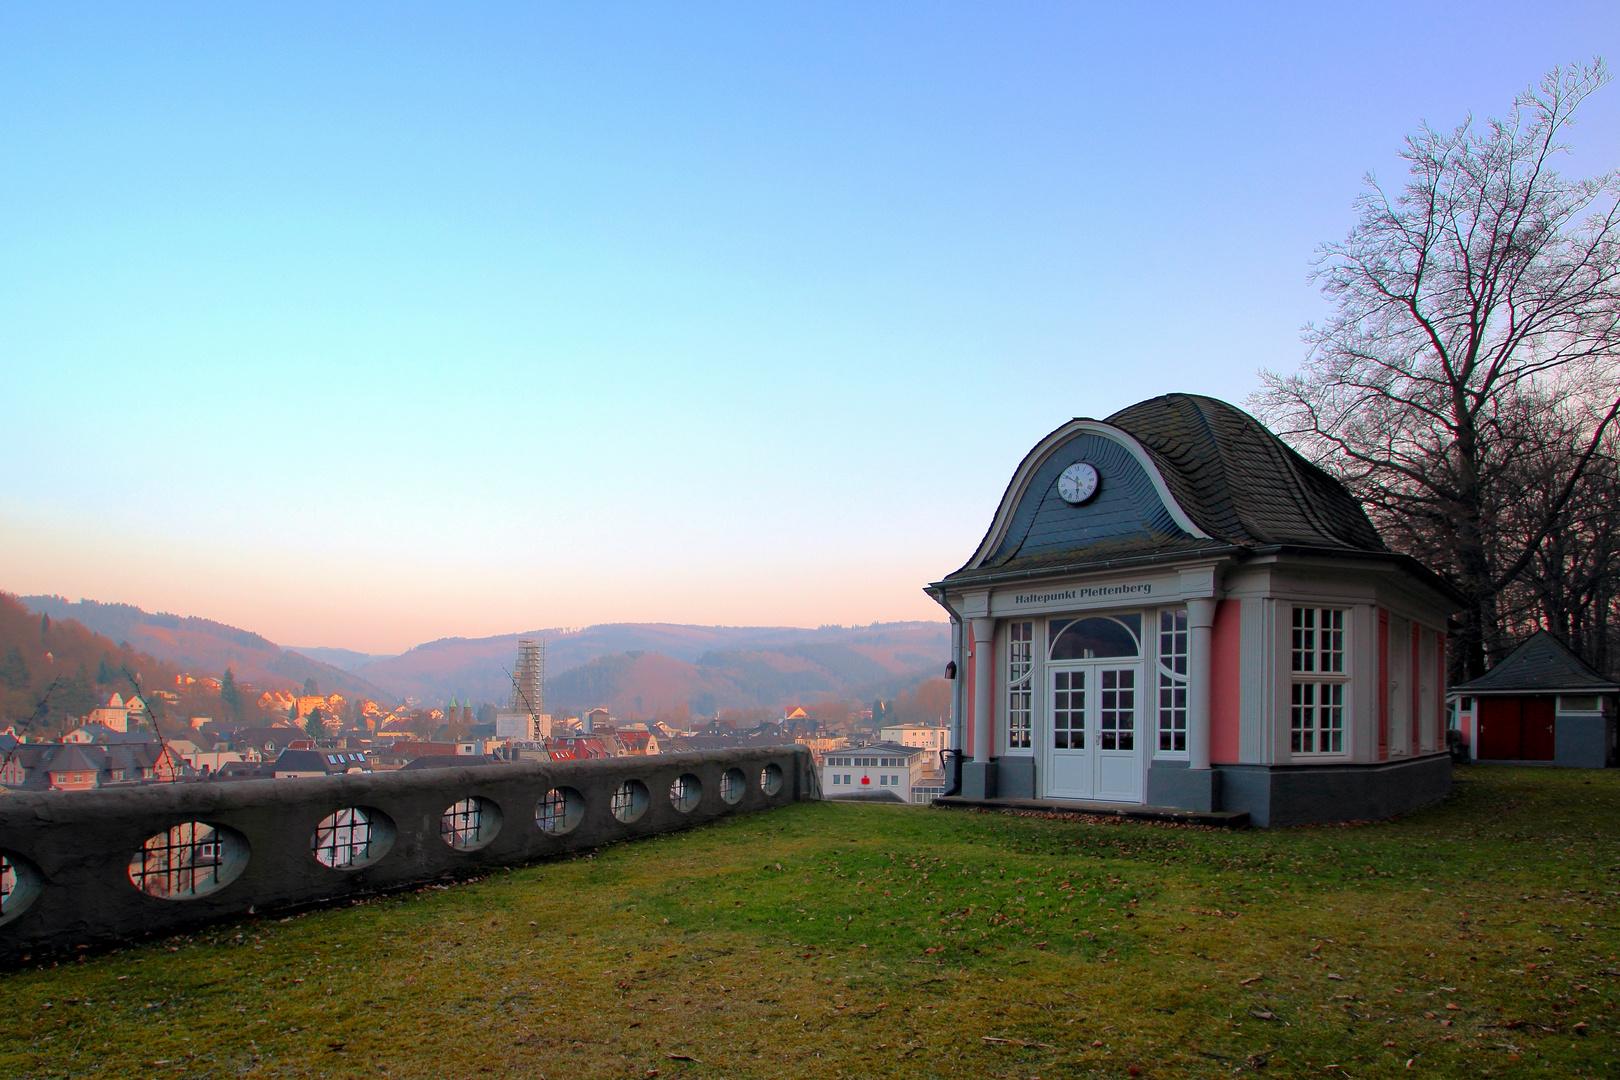 Haltepunkt Plettenberg